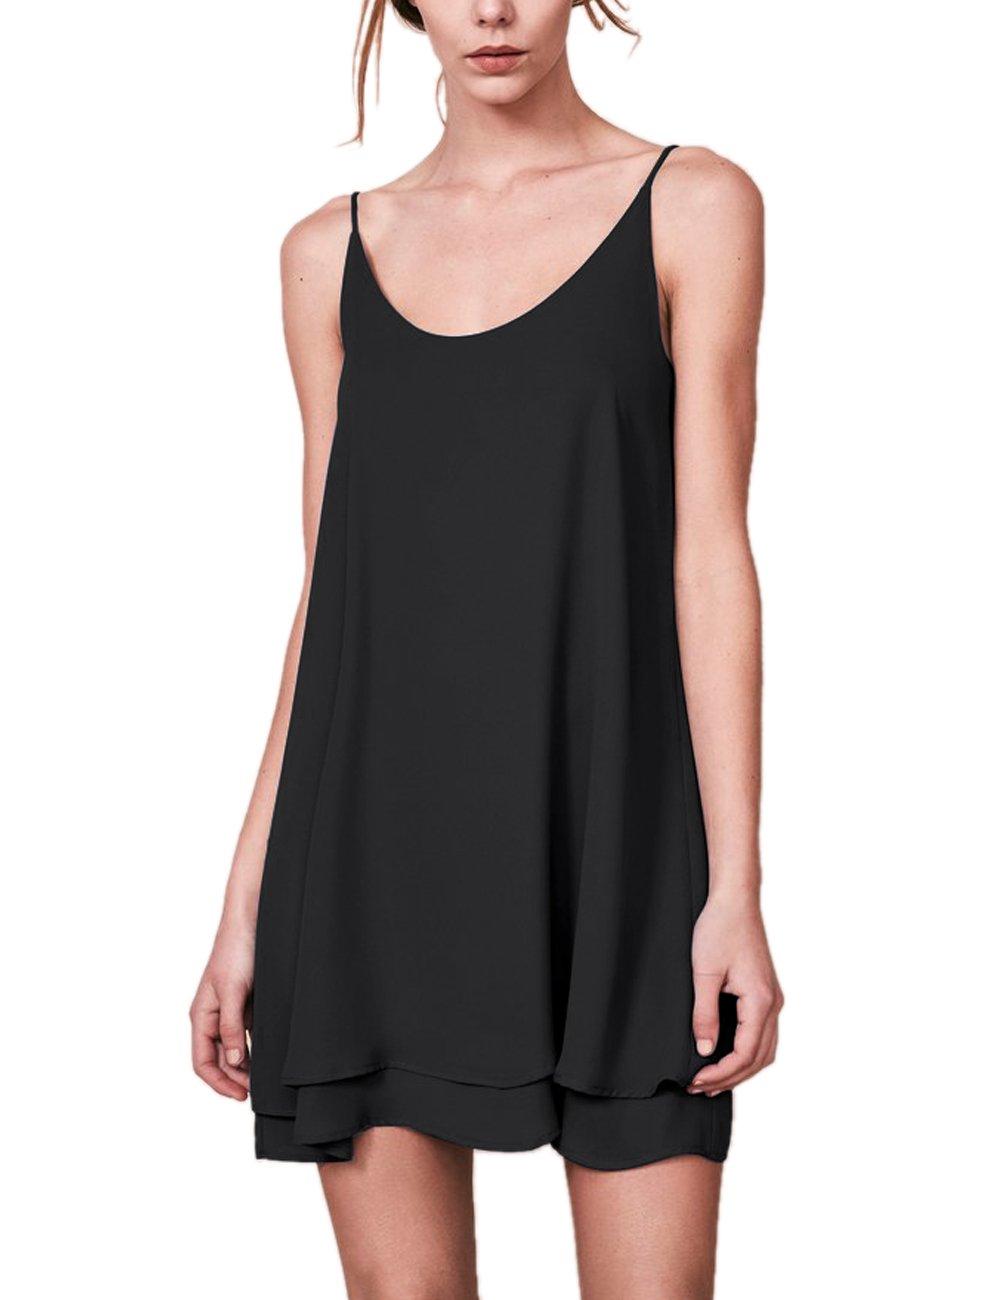 Dohia Women's Summer Sleeveless Chiffon Tank Top Dress Casual Spaghetti Strap Beach Swing Dresses Sundress C1811 (L, Black)